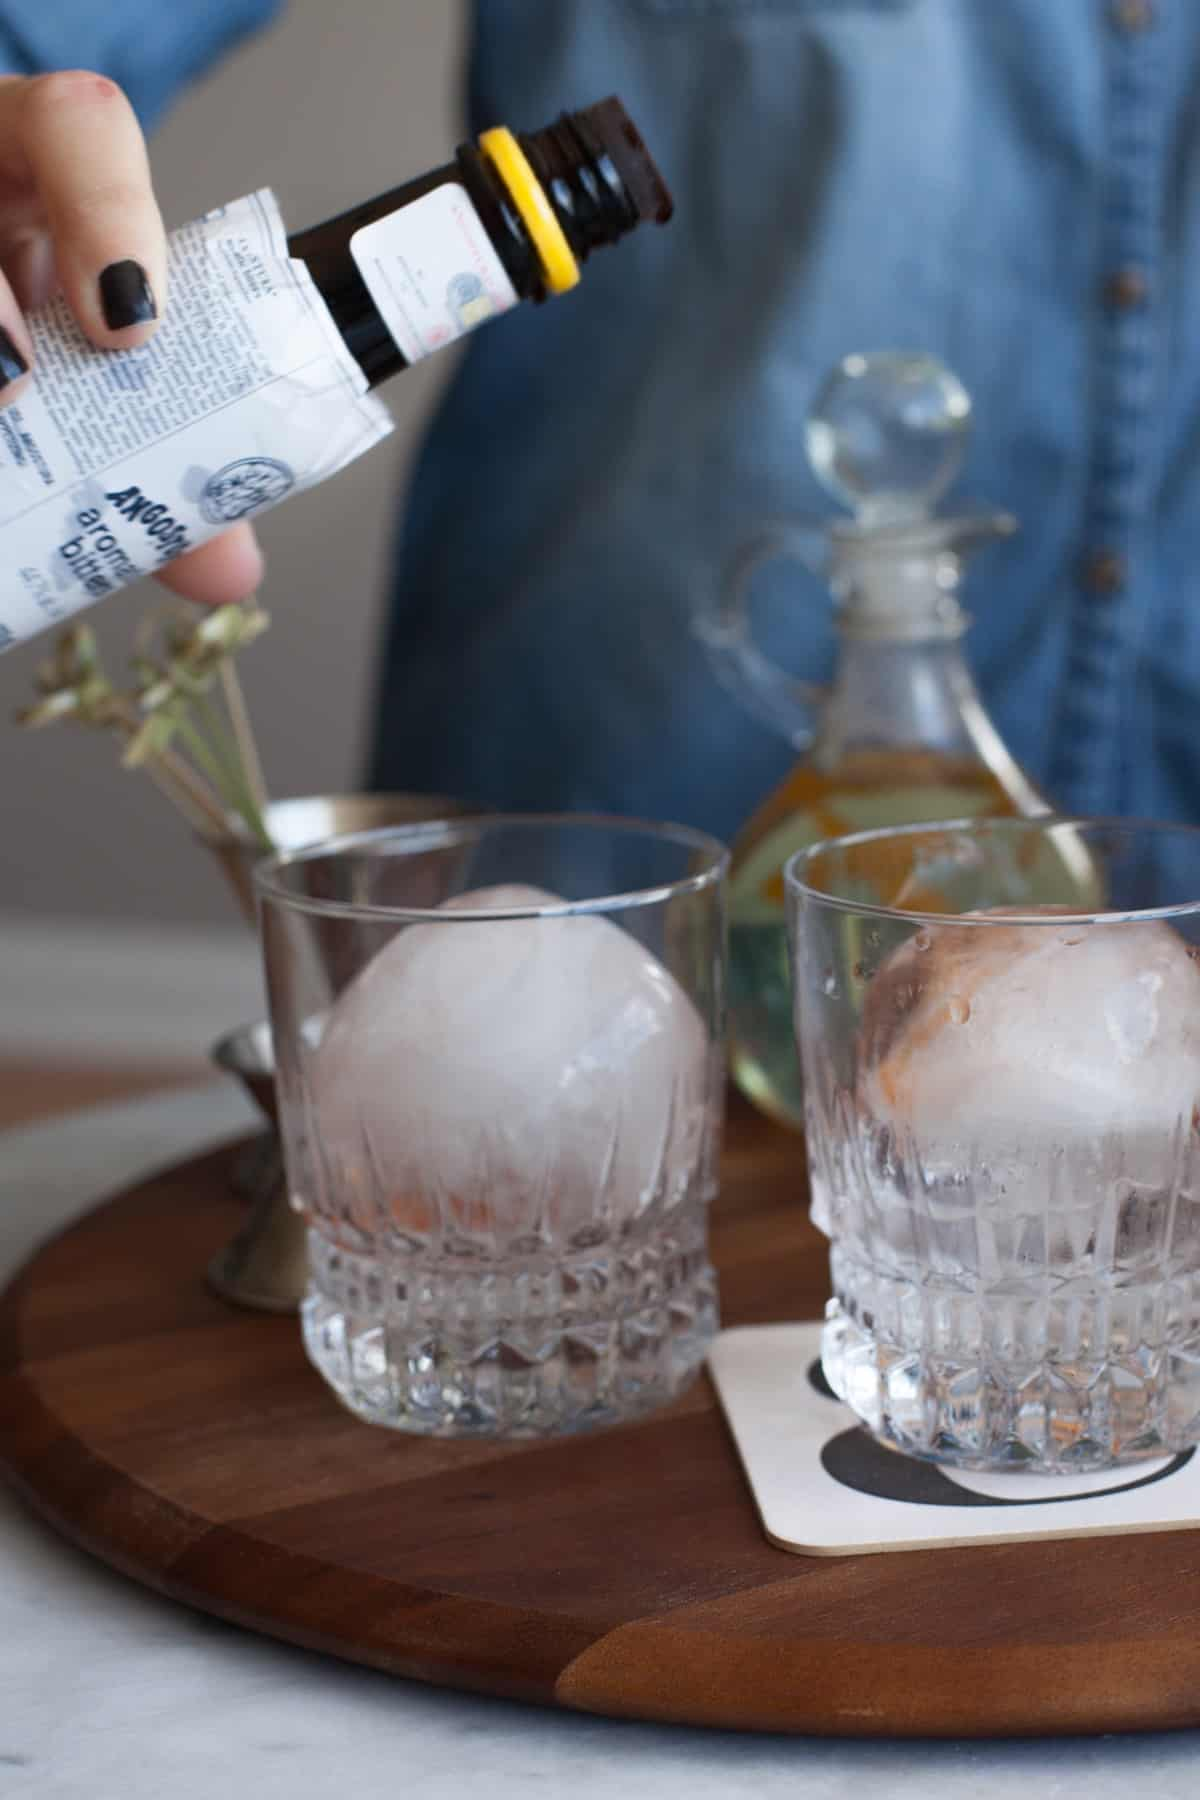 Classic Manhattan cocktail recipe with bourbon soaked cherries via @mystylevita [My Style Vita]